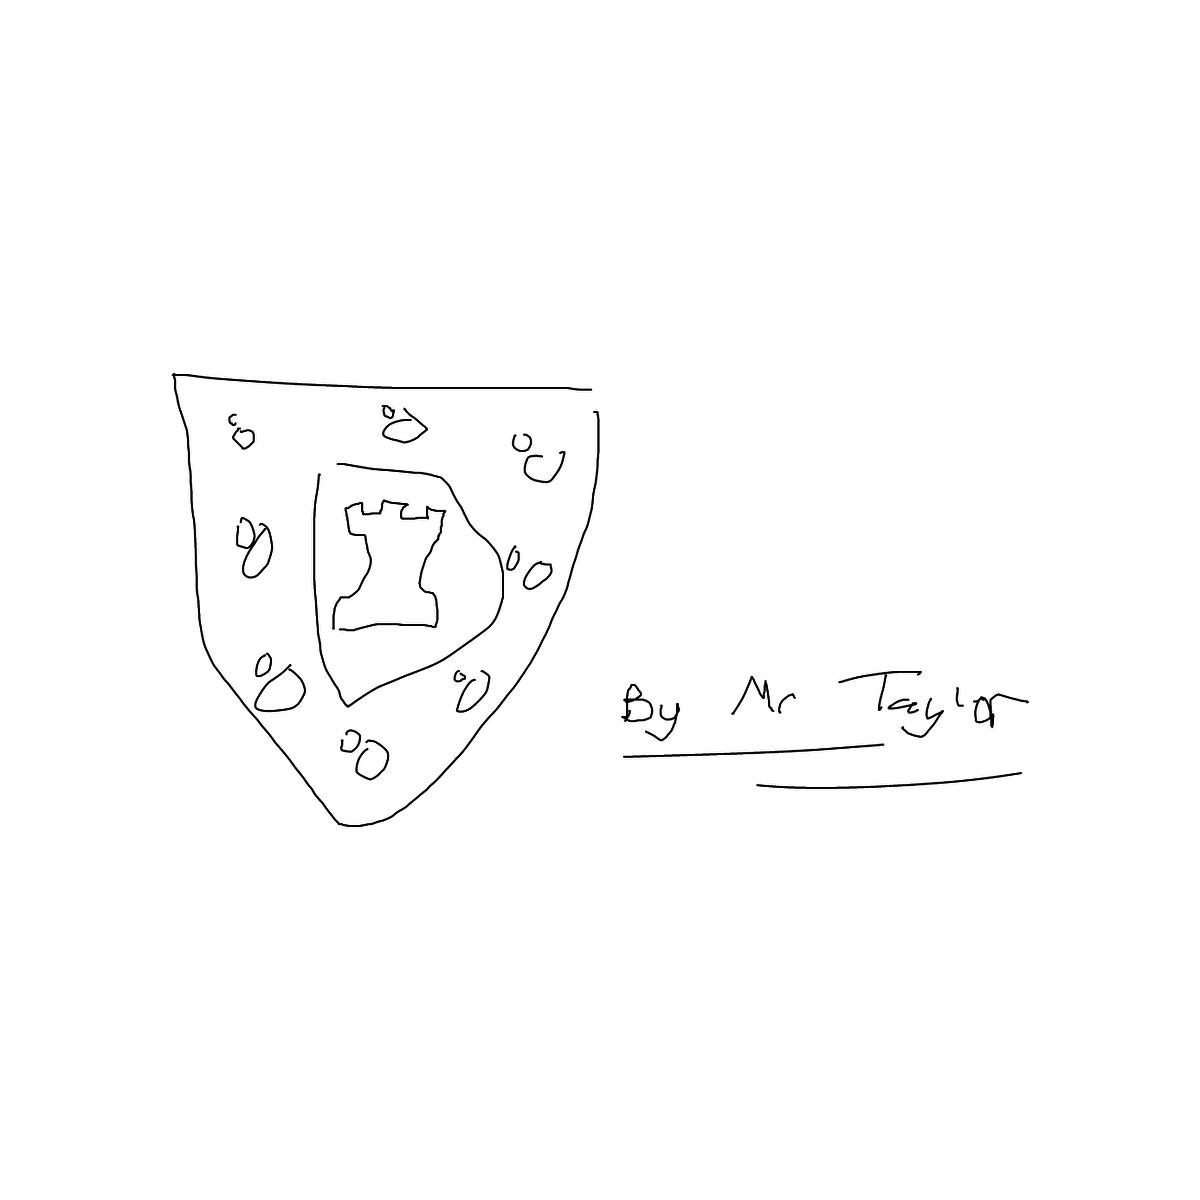 BAAAM drawing#17688 lat:55.1747131347656250lng: -1.6933465003967285